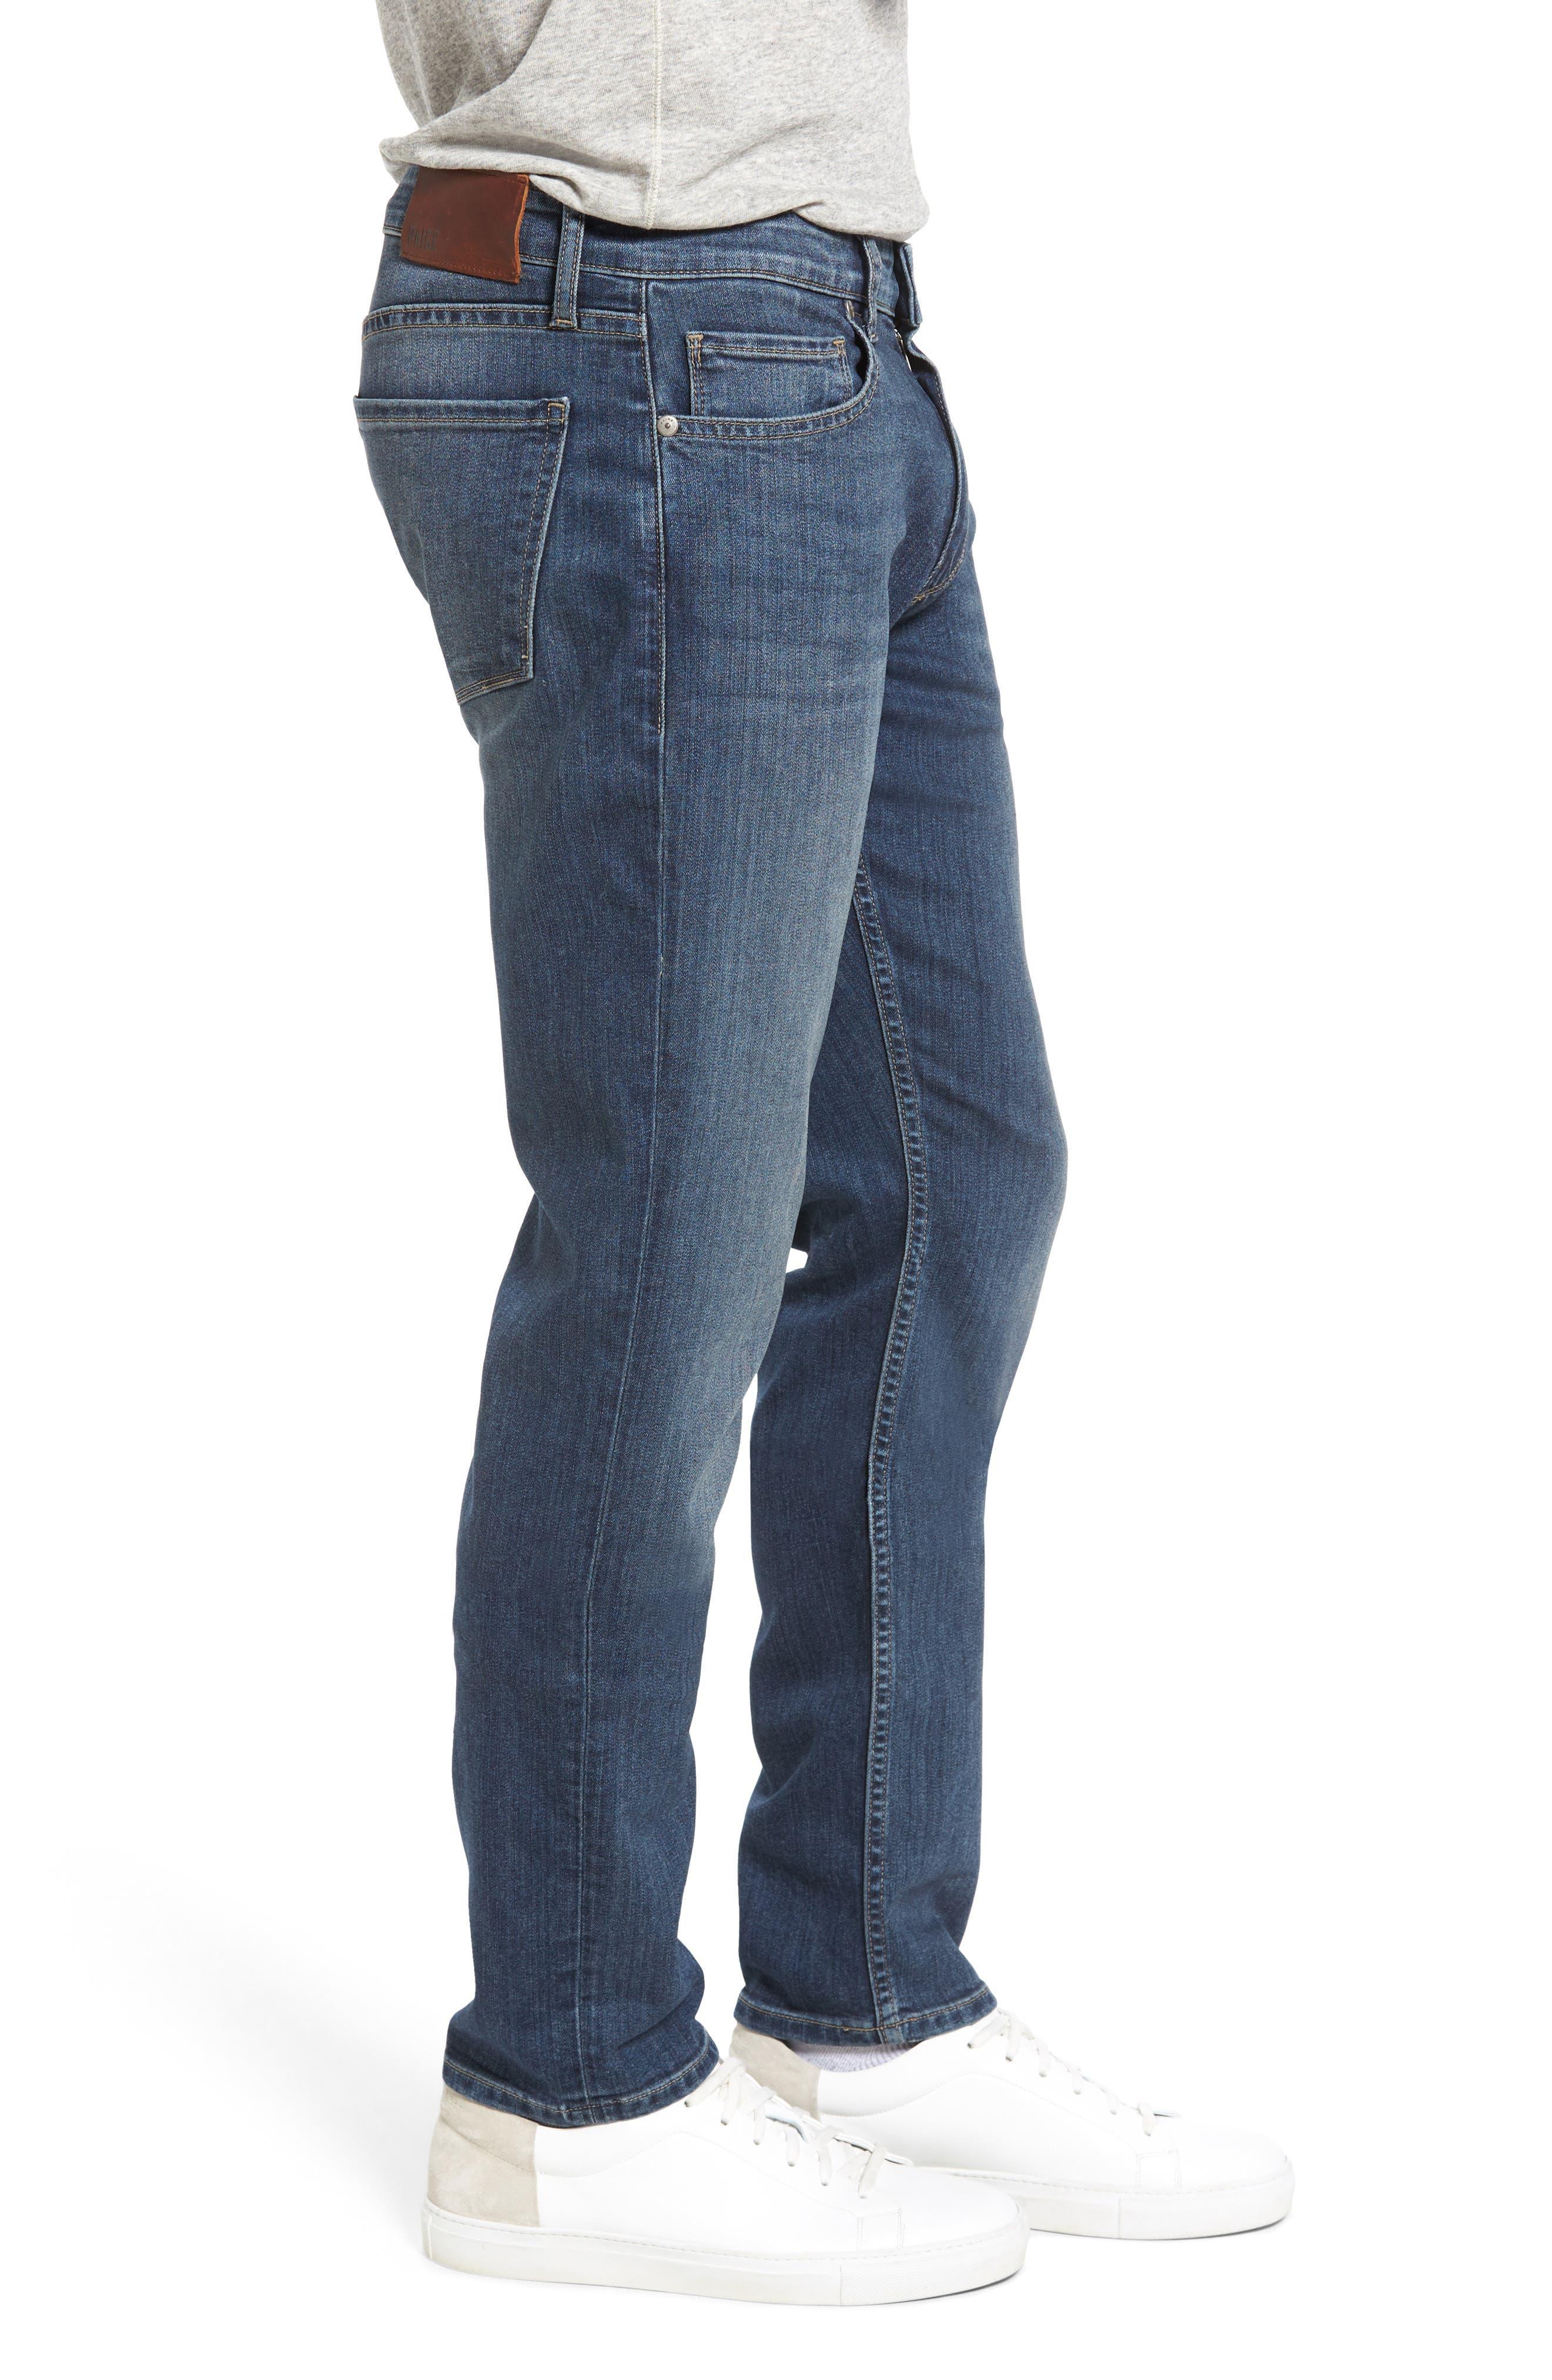 Transcend - Lennox Slim Fit Jeans,                             Alternate thumbnail 3, color,                             Elwood